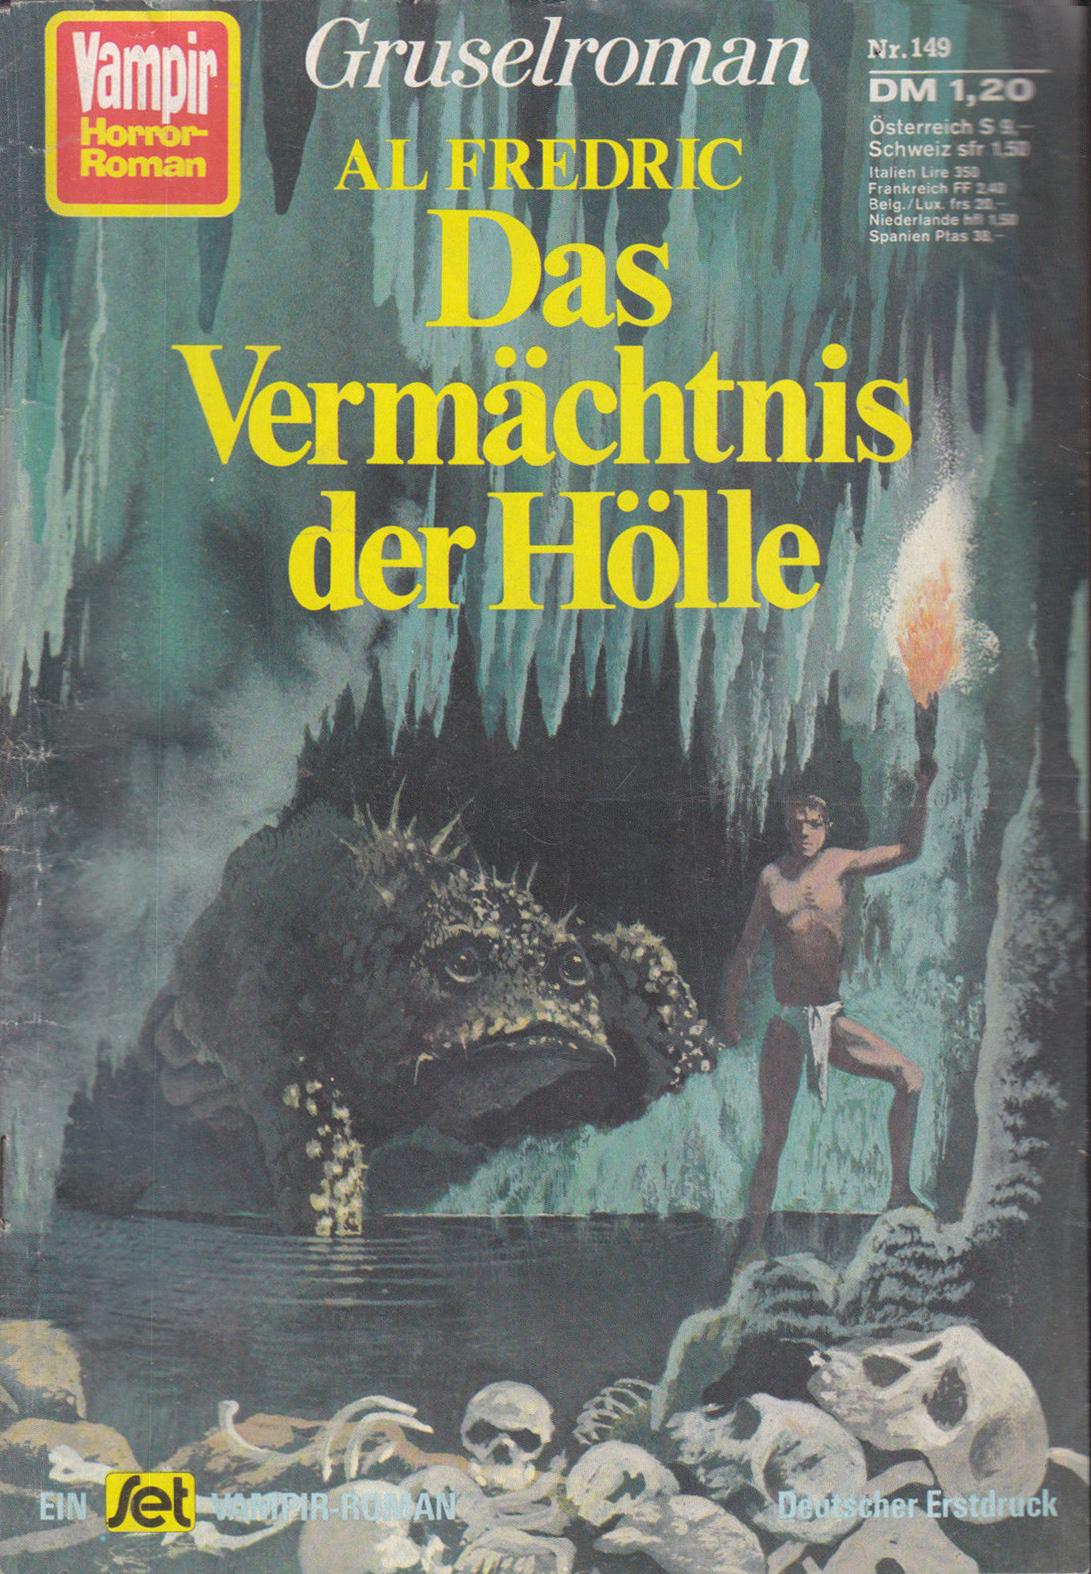 Karel Thole - Vampir Horror Roman - 149